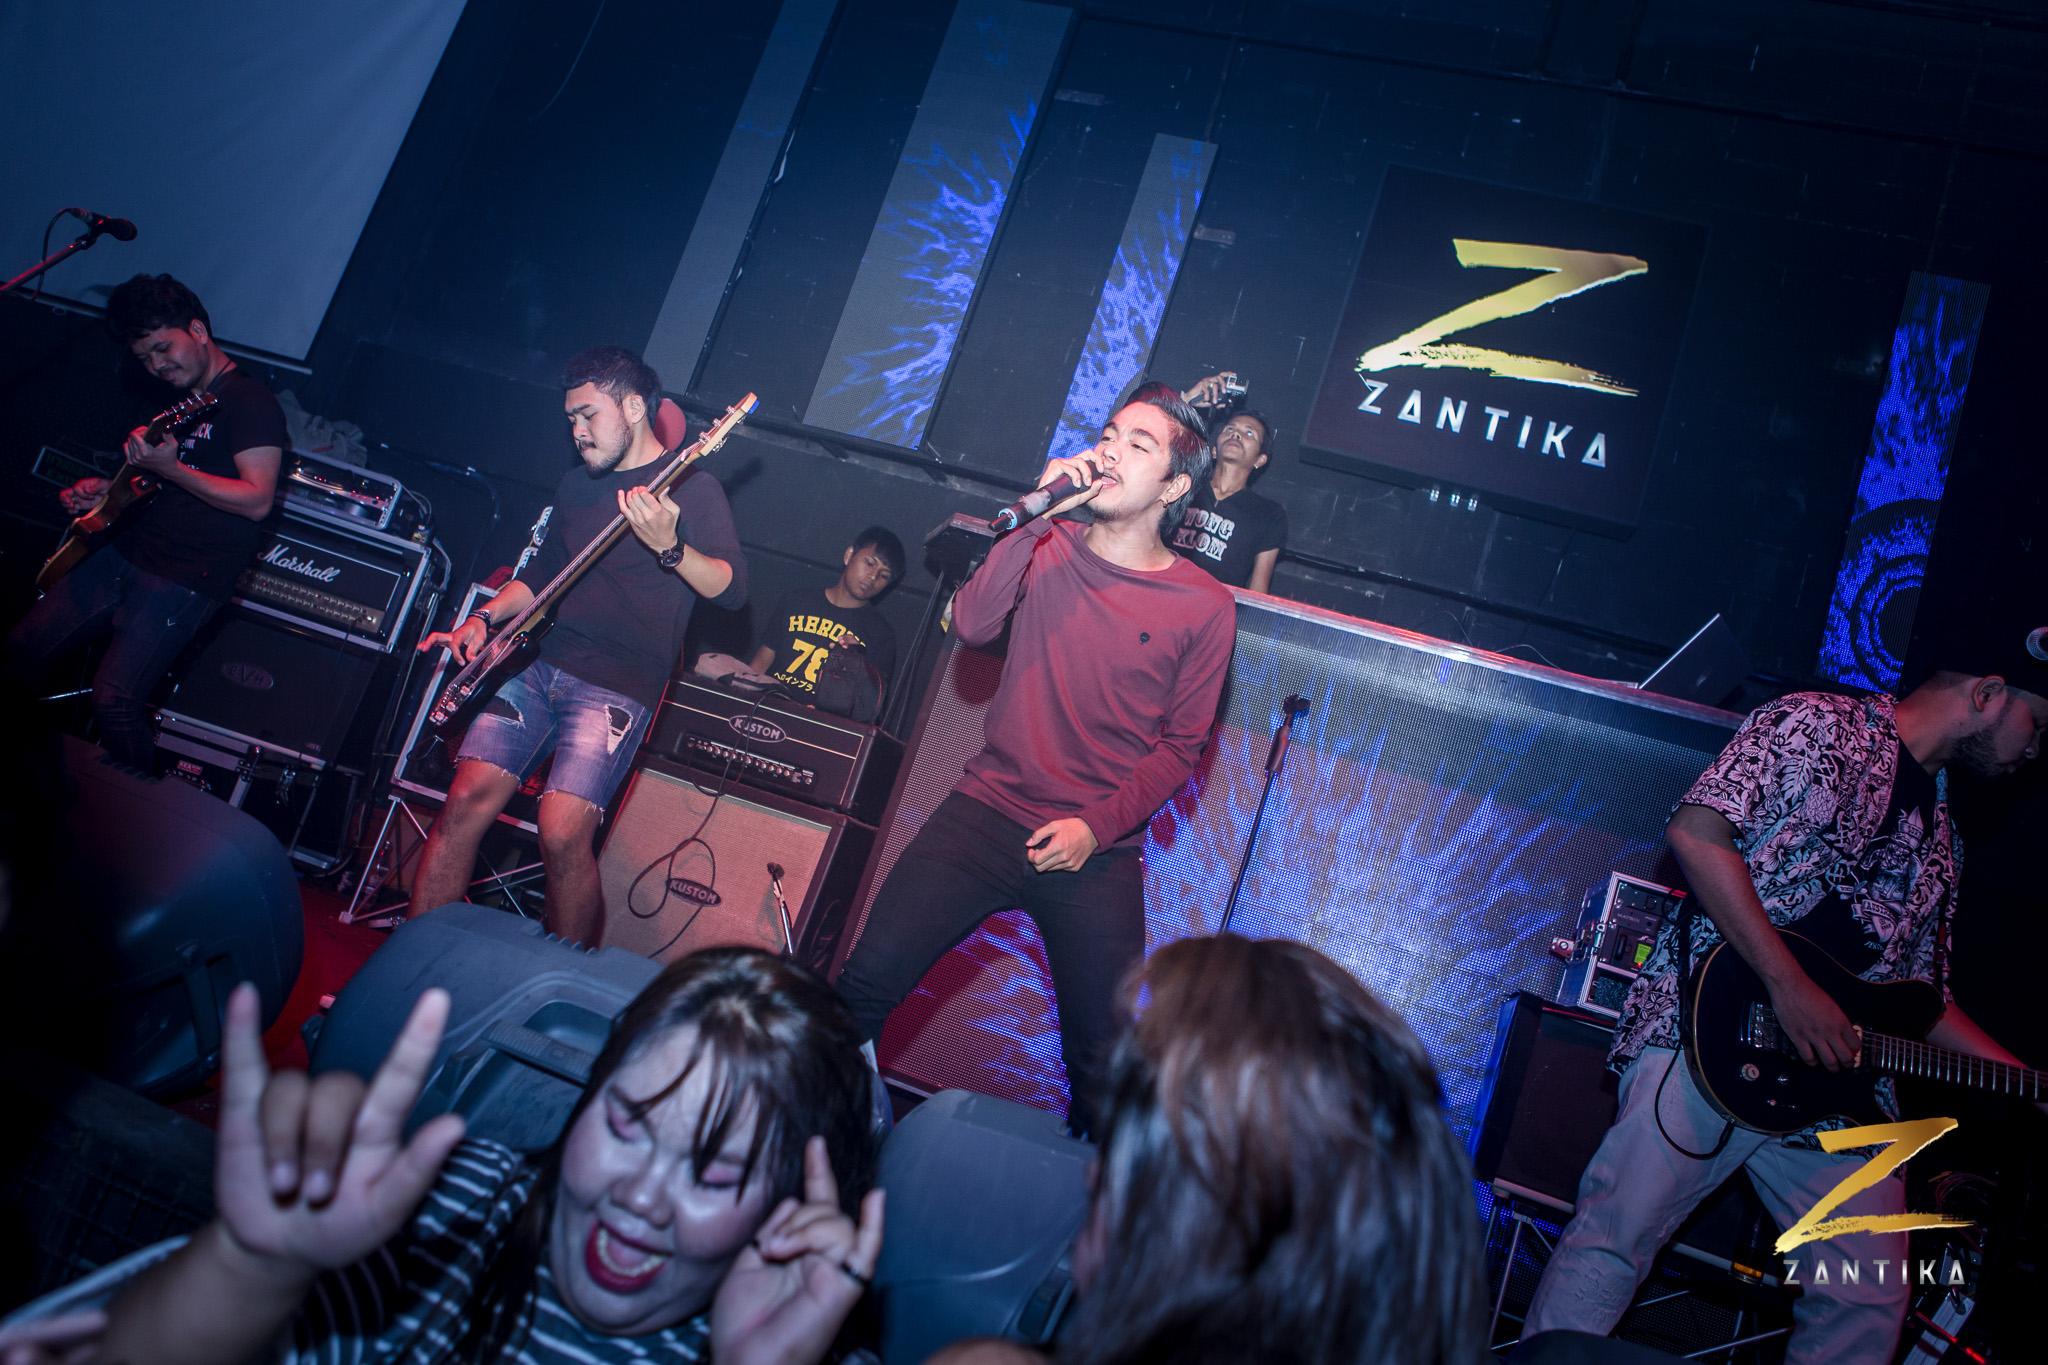 Zantika - วงกลม-71